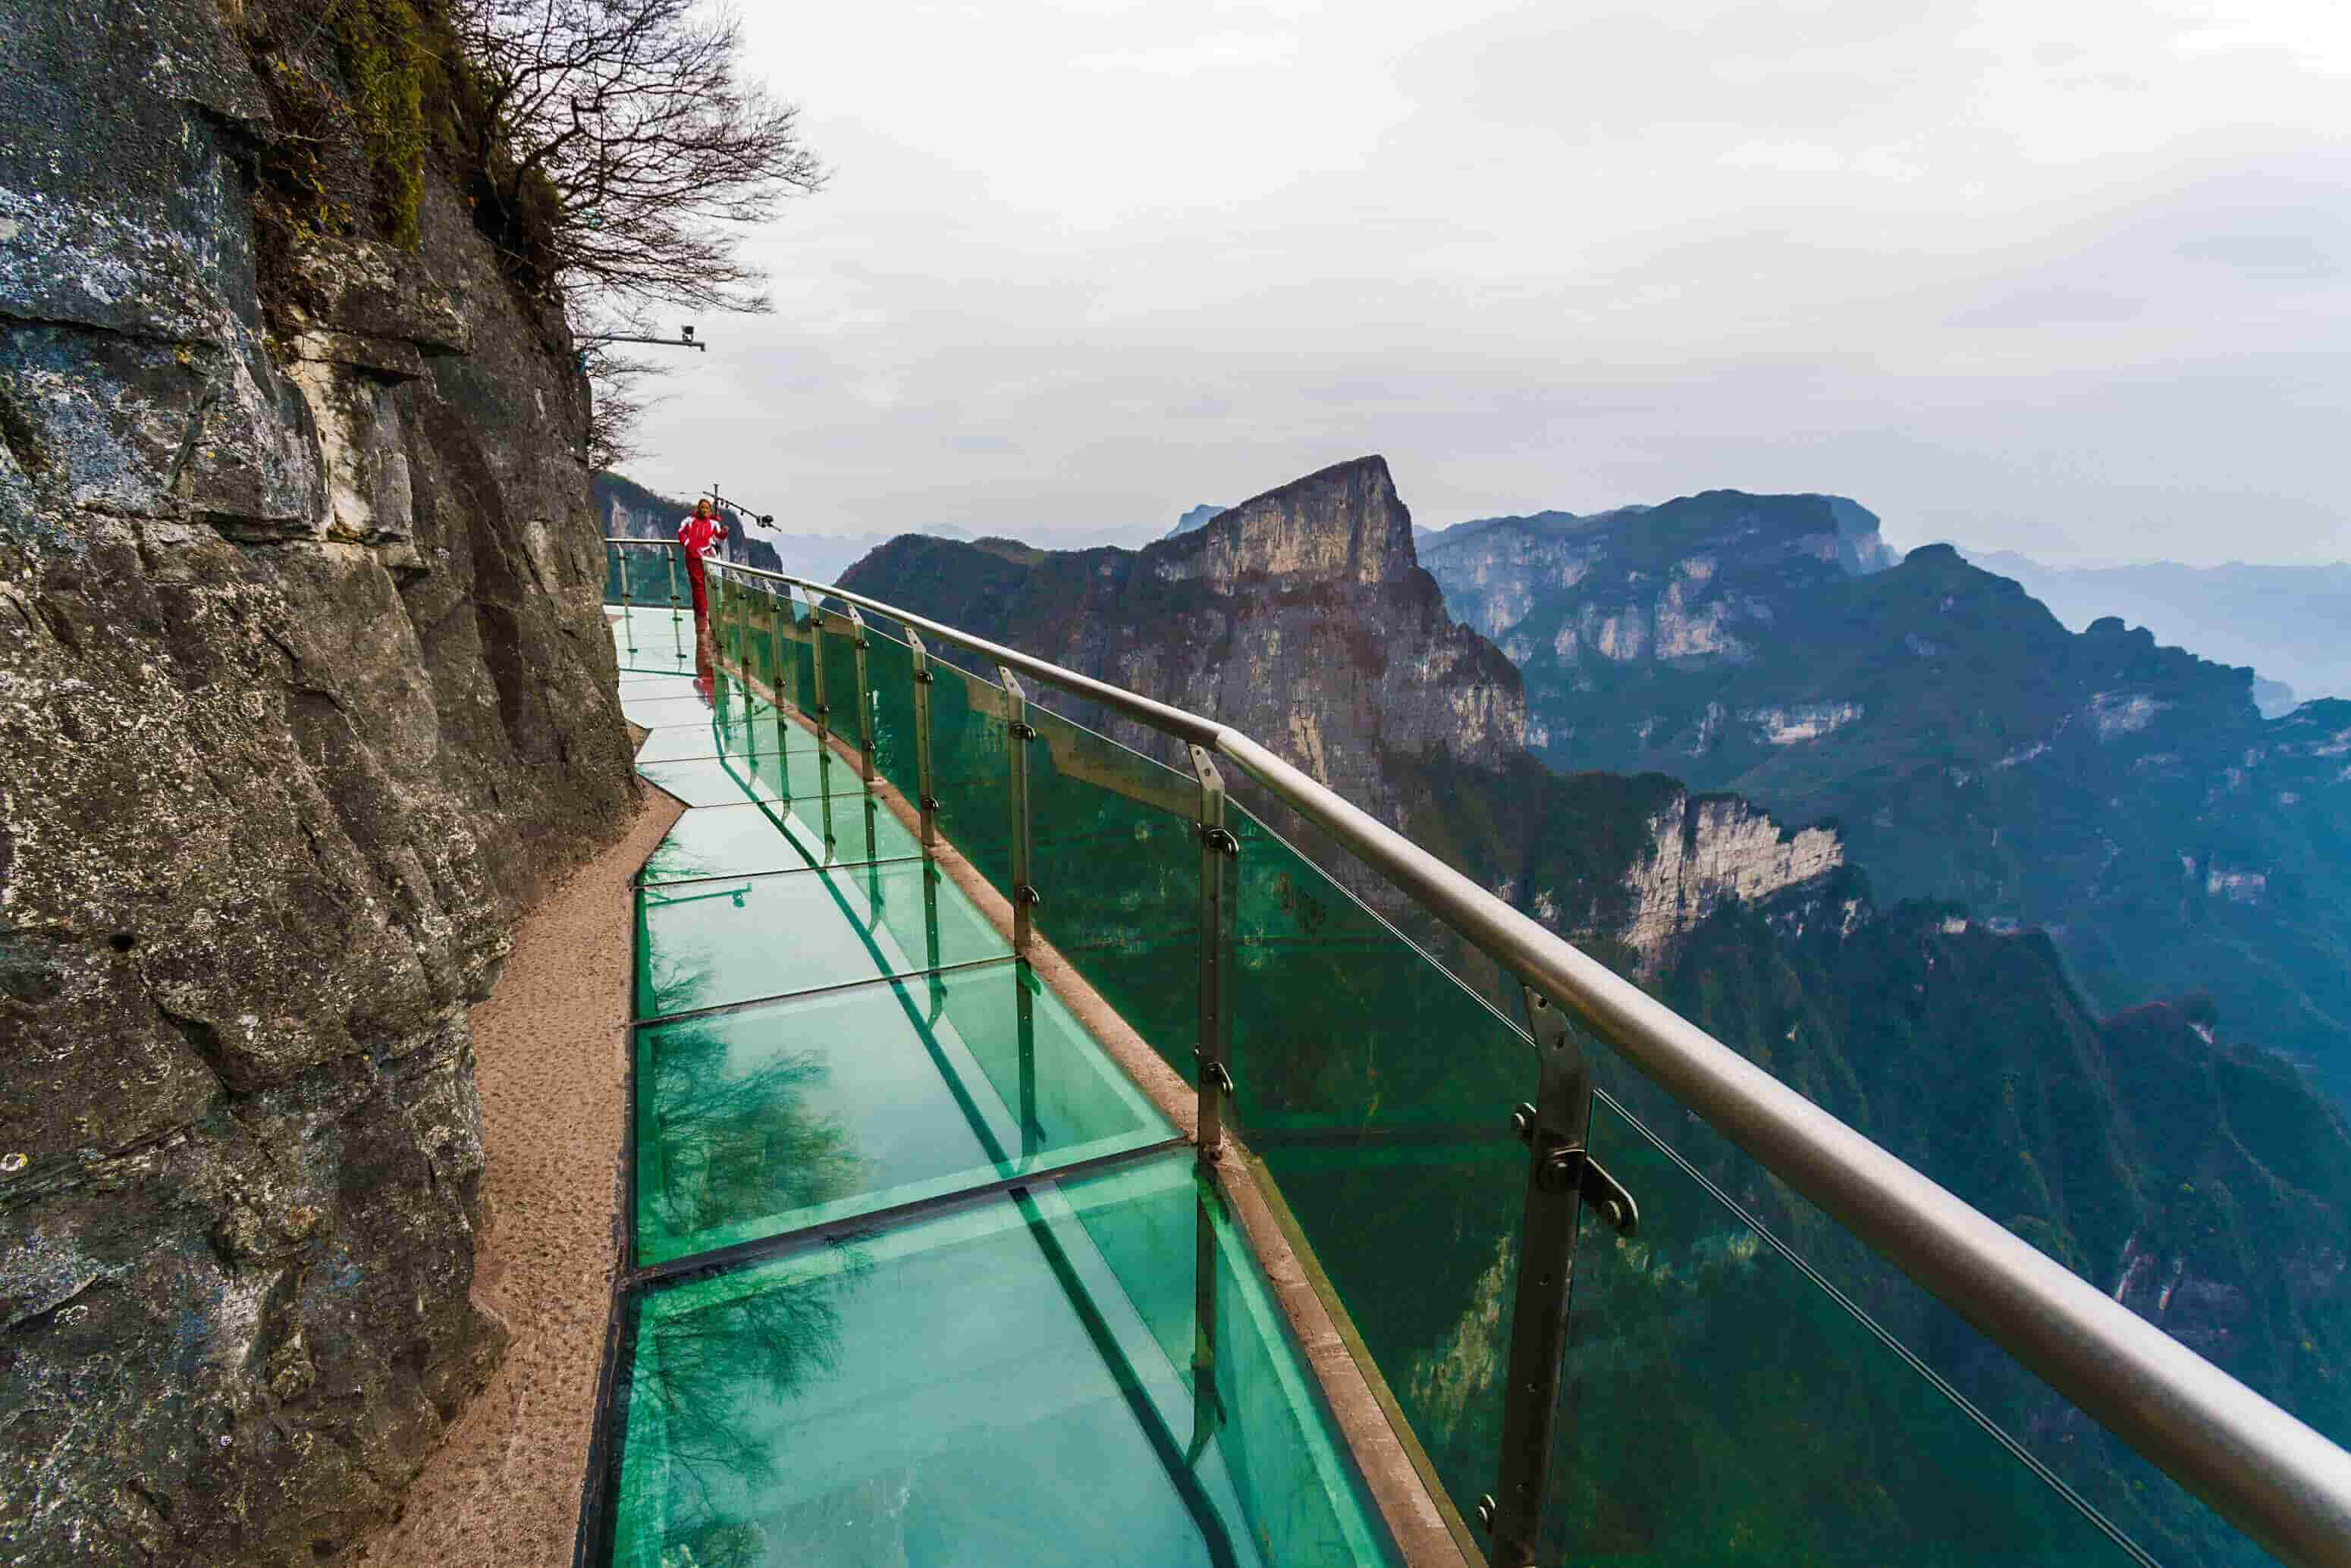 Tianmen Mountain Glass Skywalk